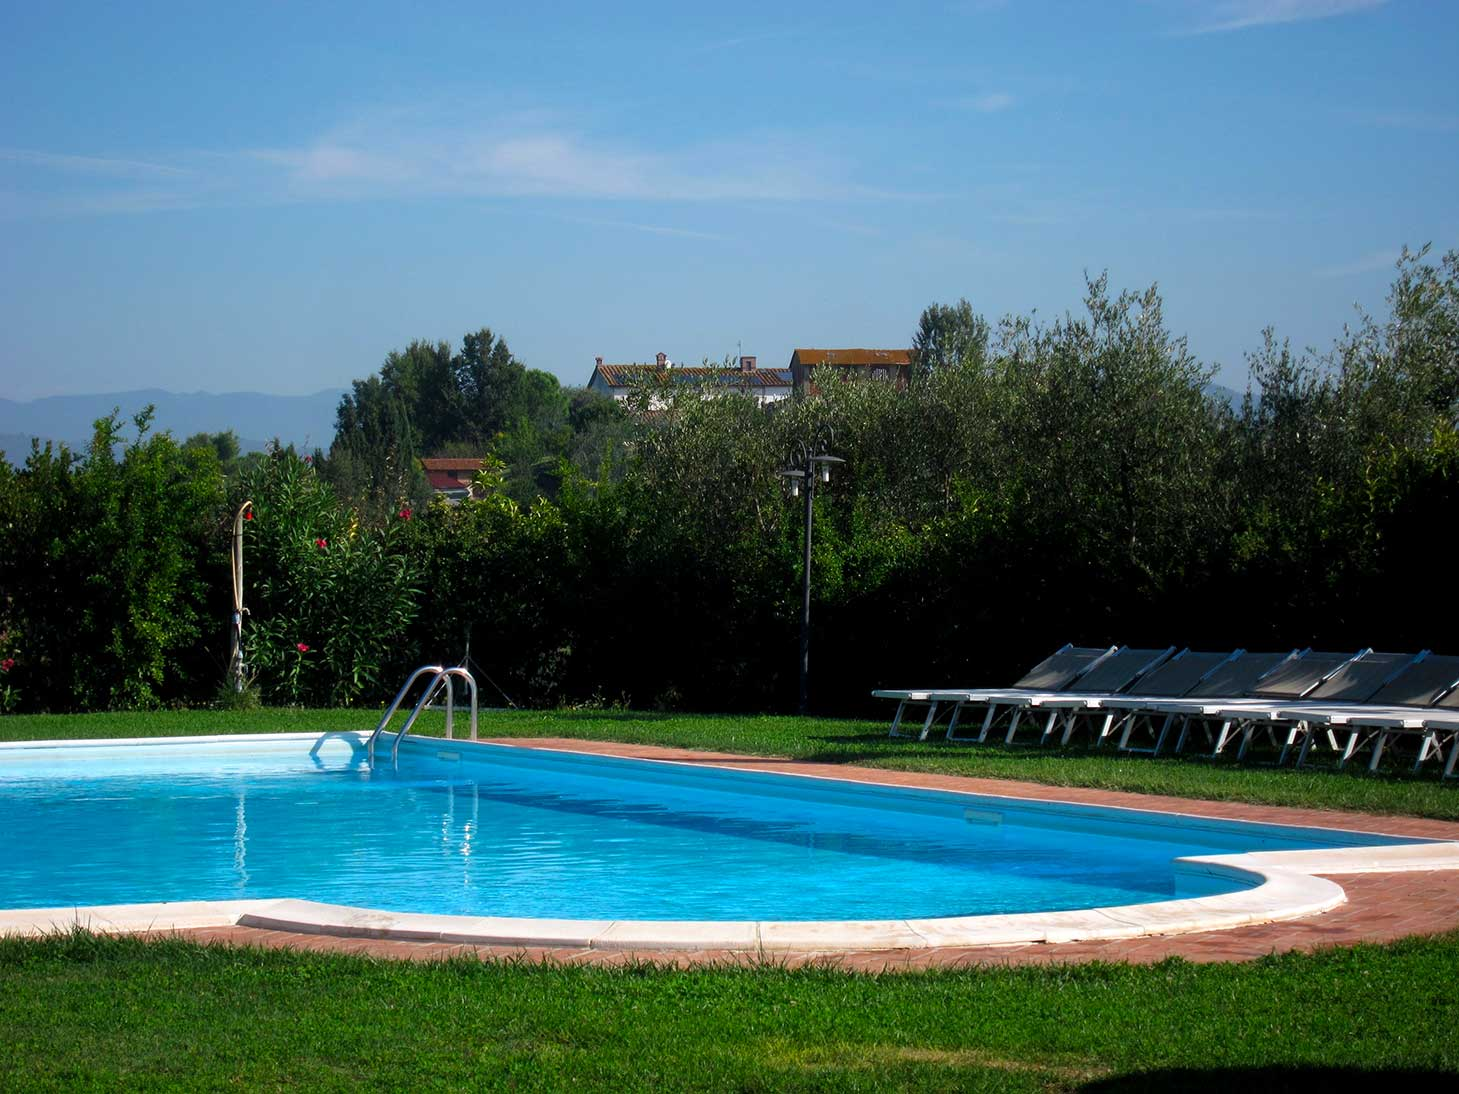 Agriturismo piscina firenze agriturismo piscina toscana for Piscina firenze